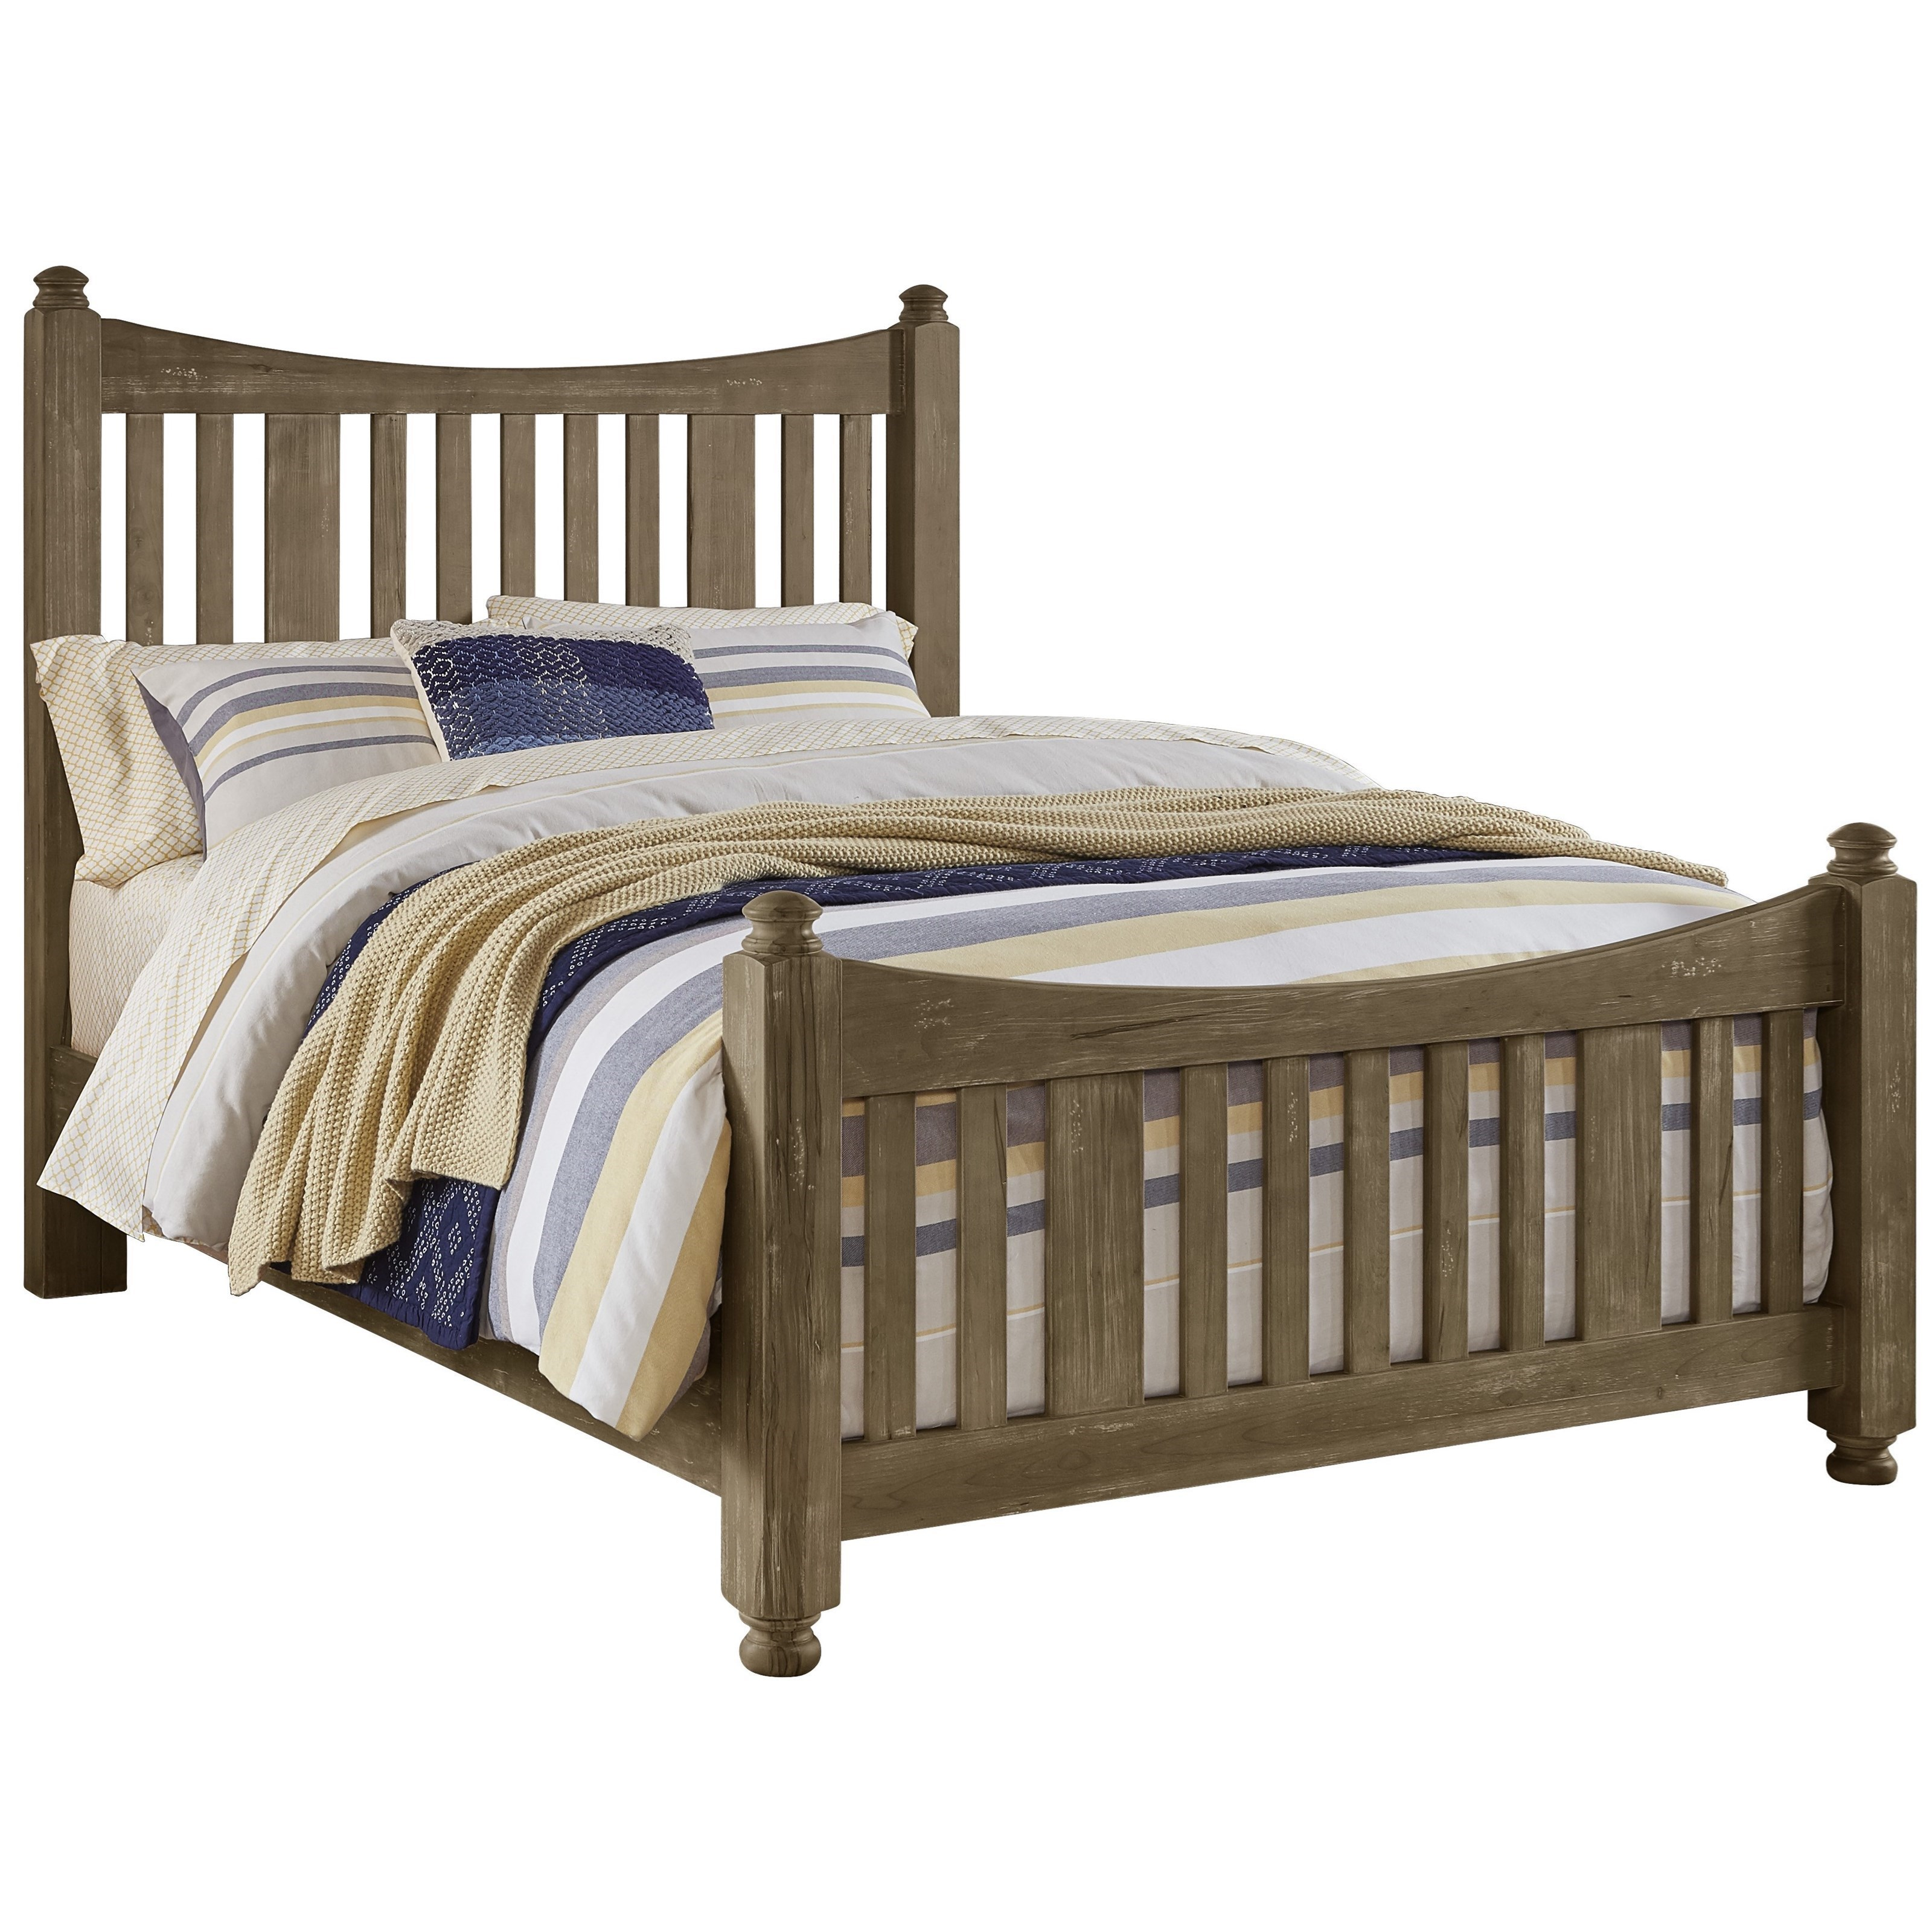 Solid Wood Queen Slat Poster Bed